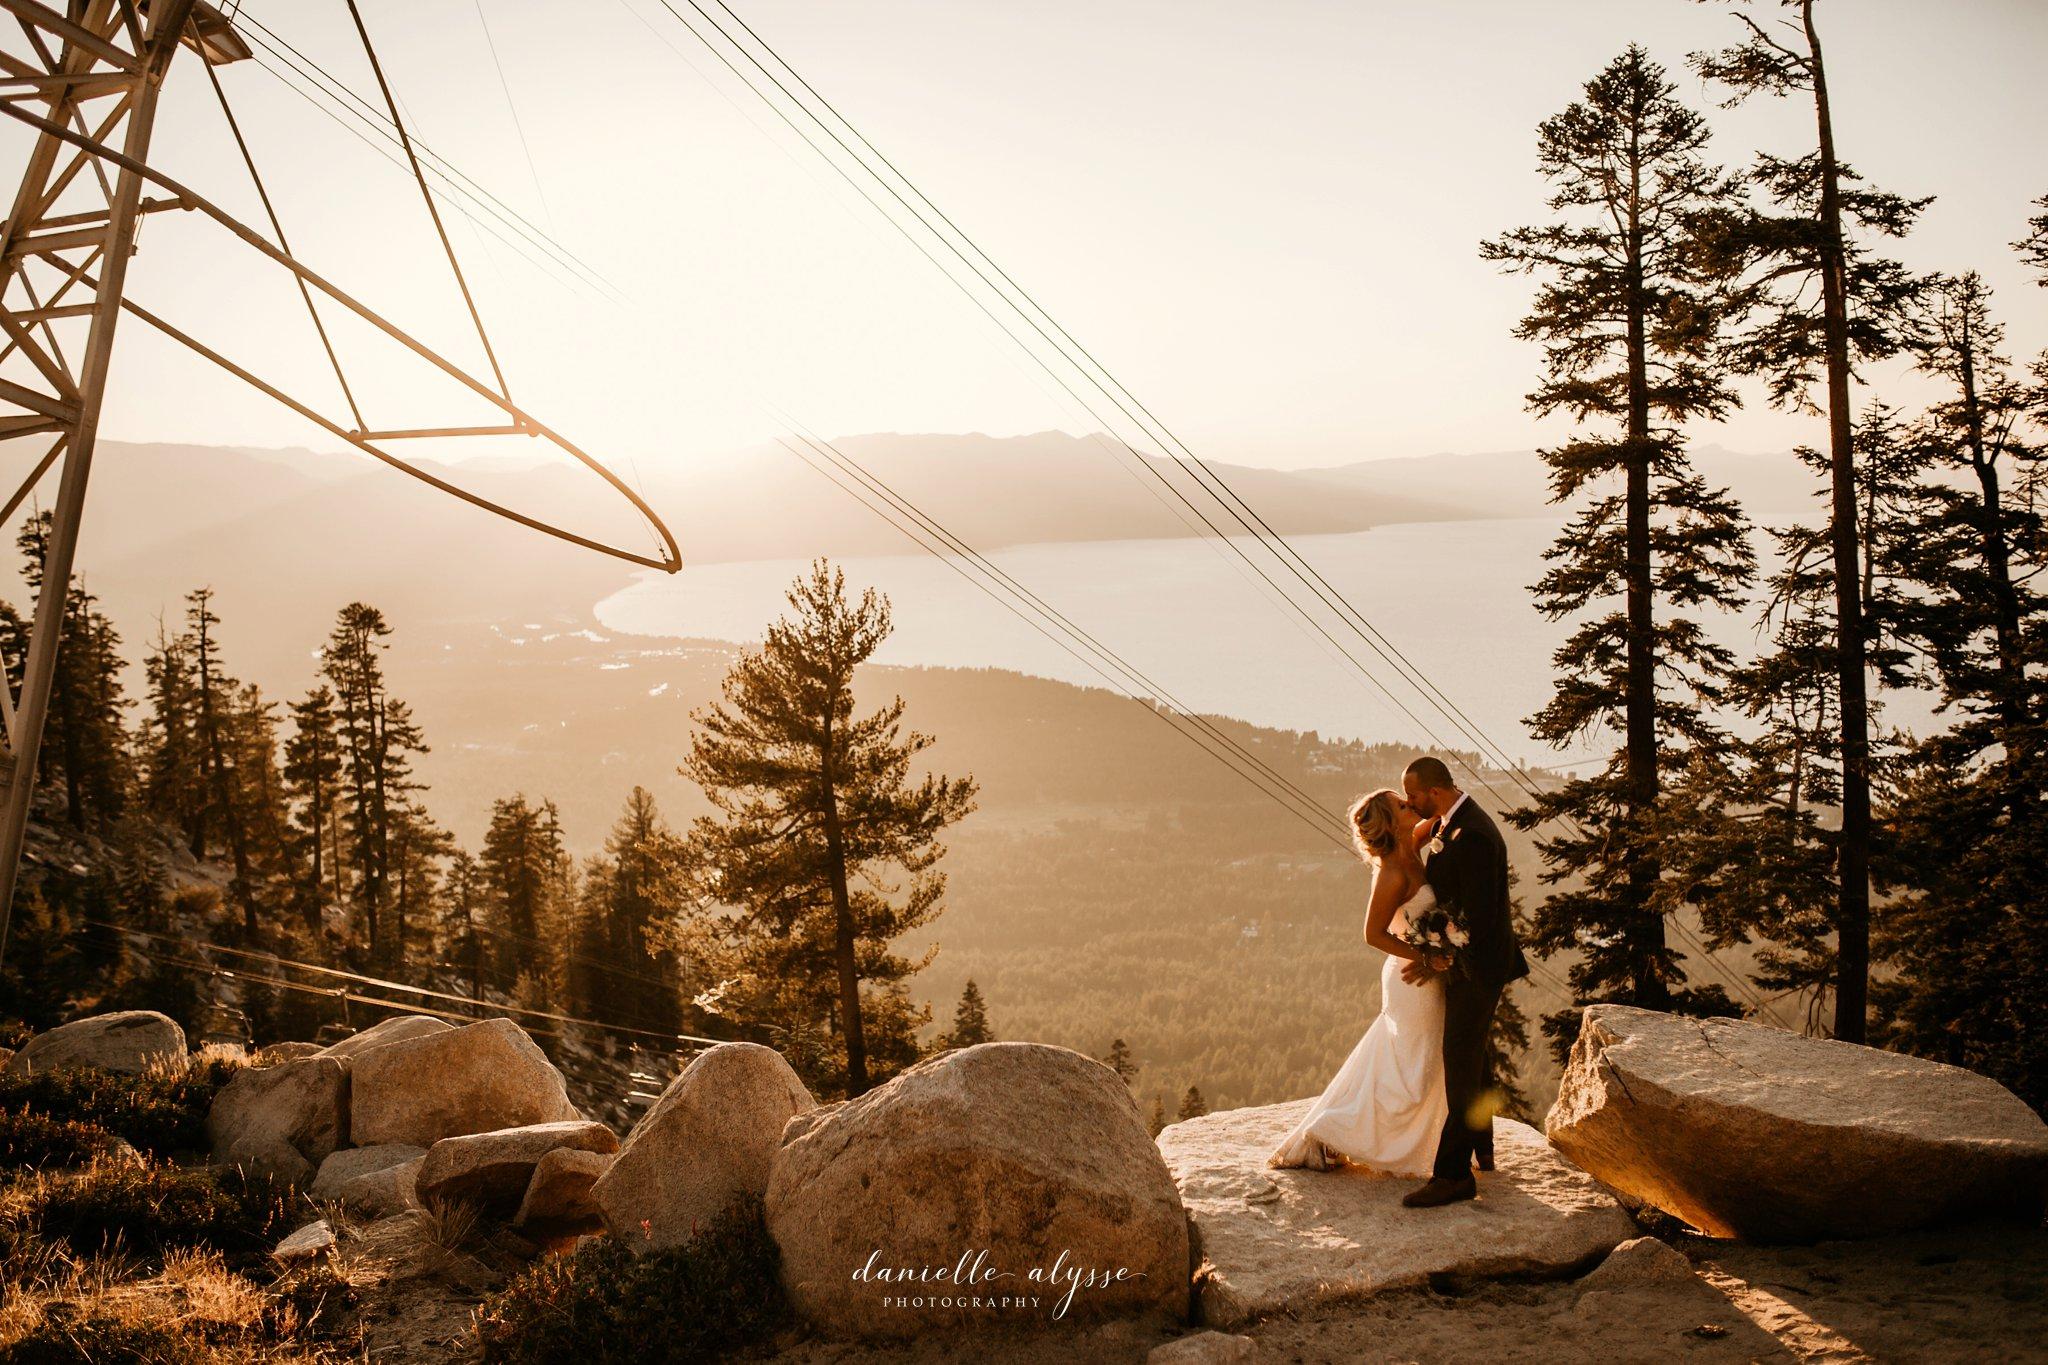 180831_wedding_stephanie_heavenly_south_lake_tahoe_danielle_alysse_photography_destination_blog_995_WEB.jpg